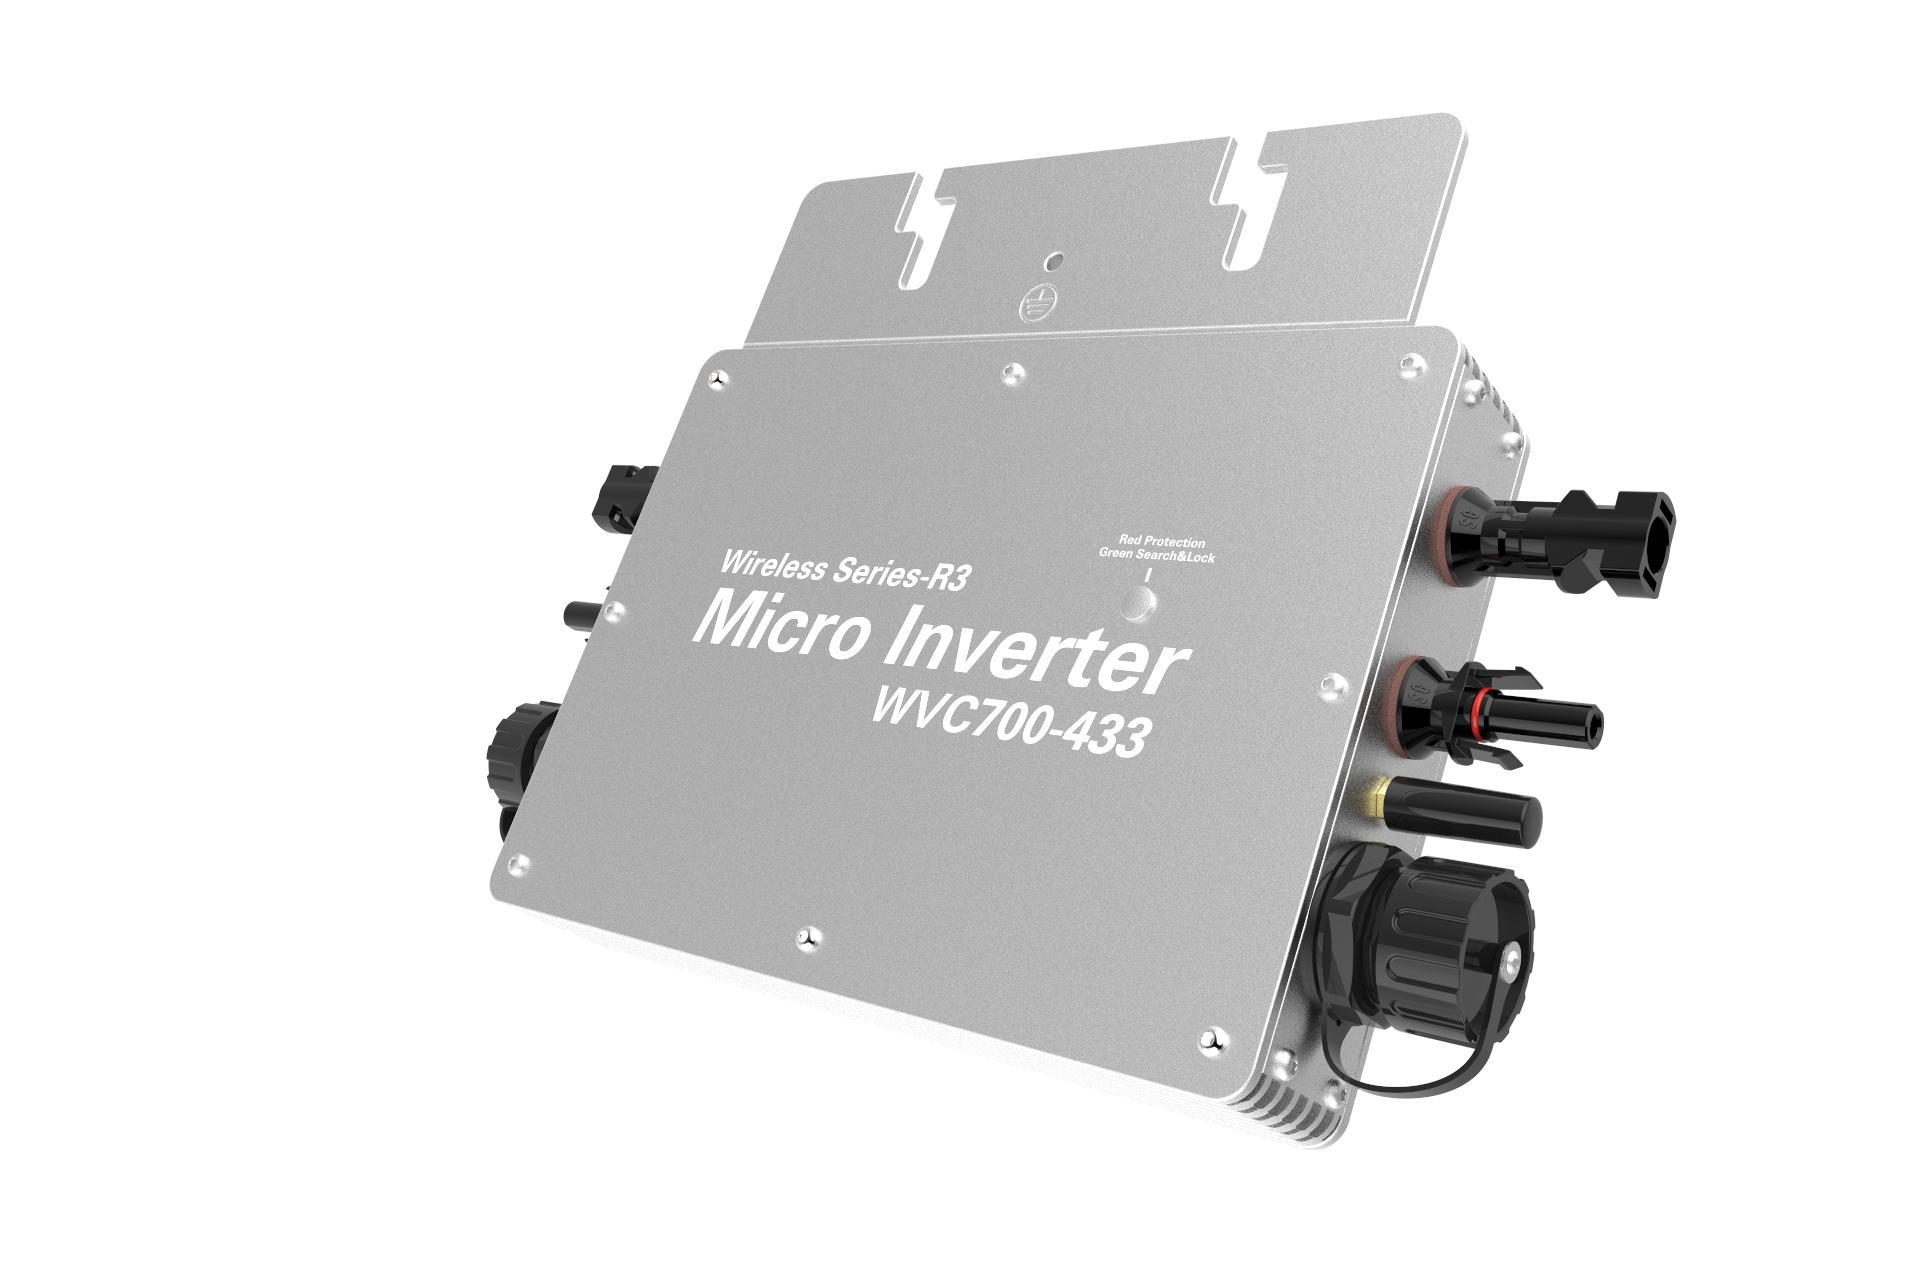 Mikroinwerter_ WVC700 (3)